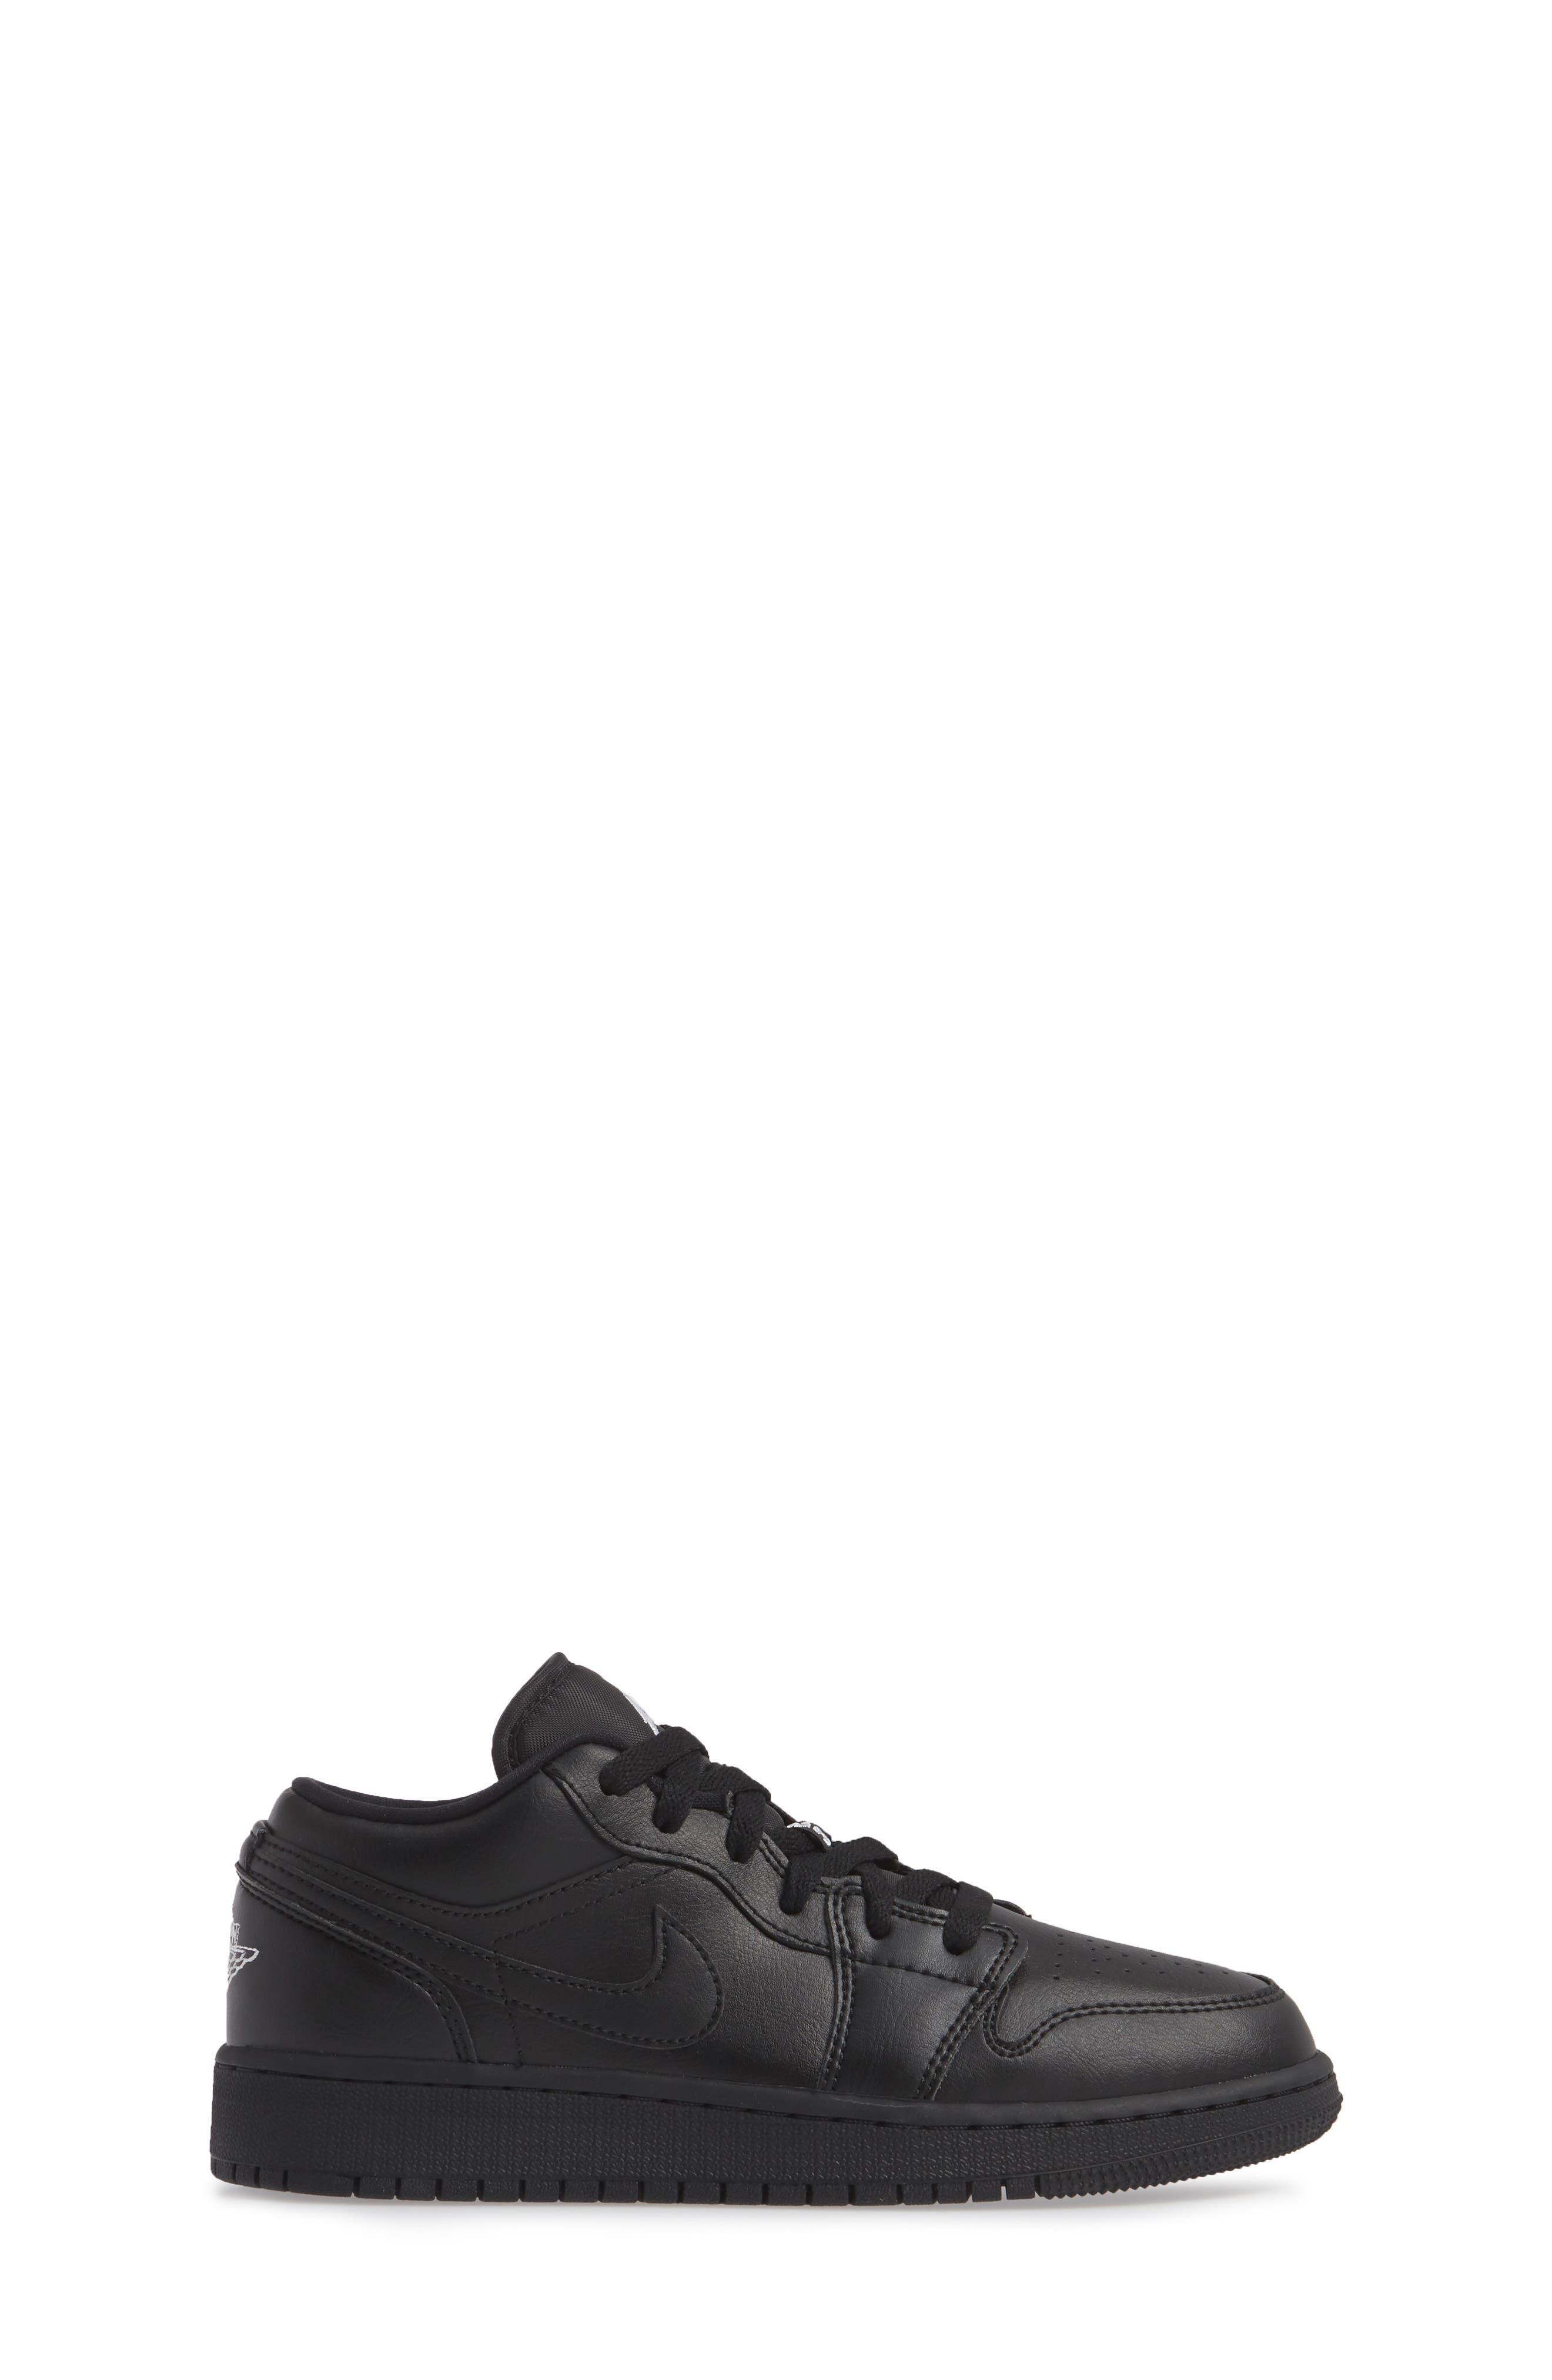 Nike 'Air Jordan 1 Low' Sneaker,                             Alternate thumbnail 3, color,                             BLACK/ WHITE/ BLACK